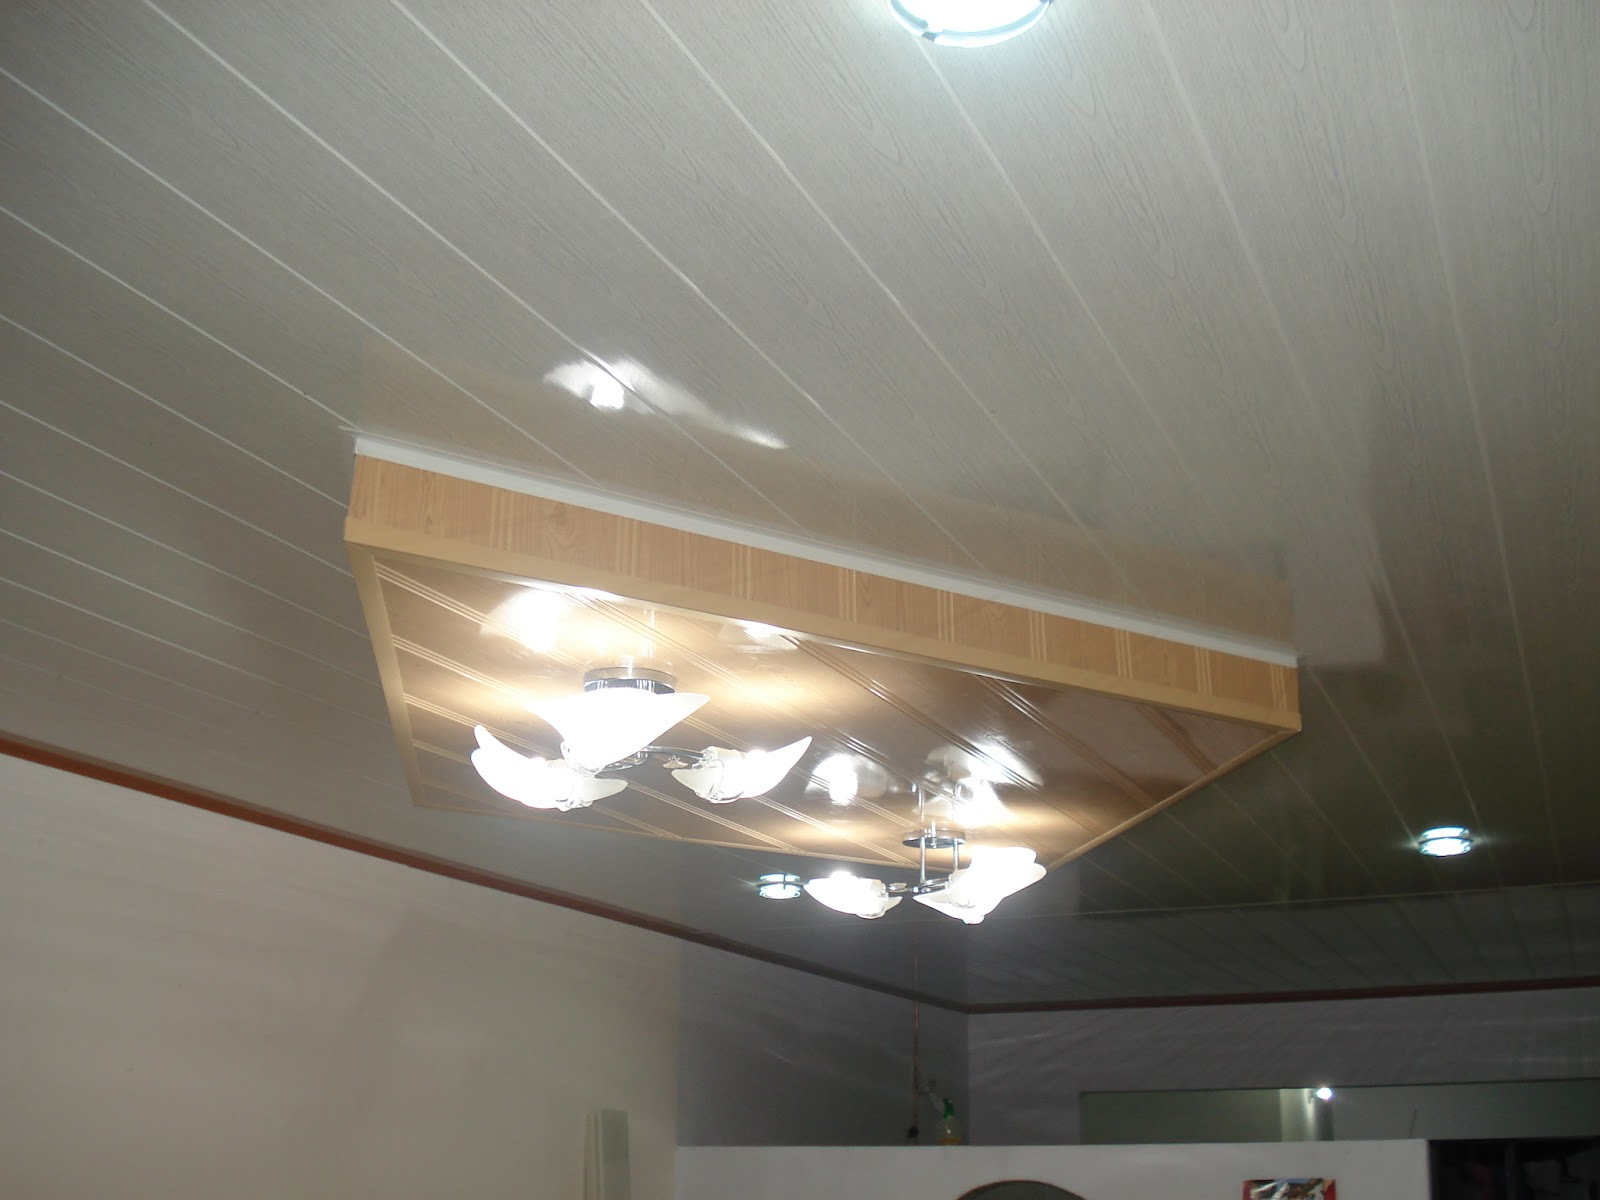 Wilson leon dise os arquitectonicos para sus espacios - Falsos techos pvc ...